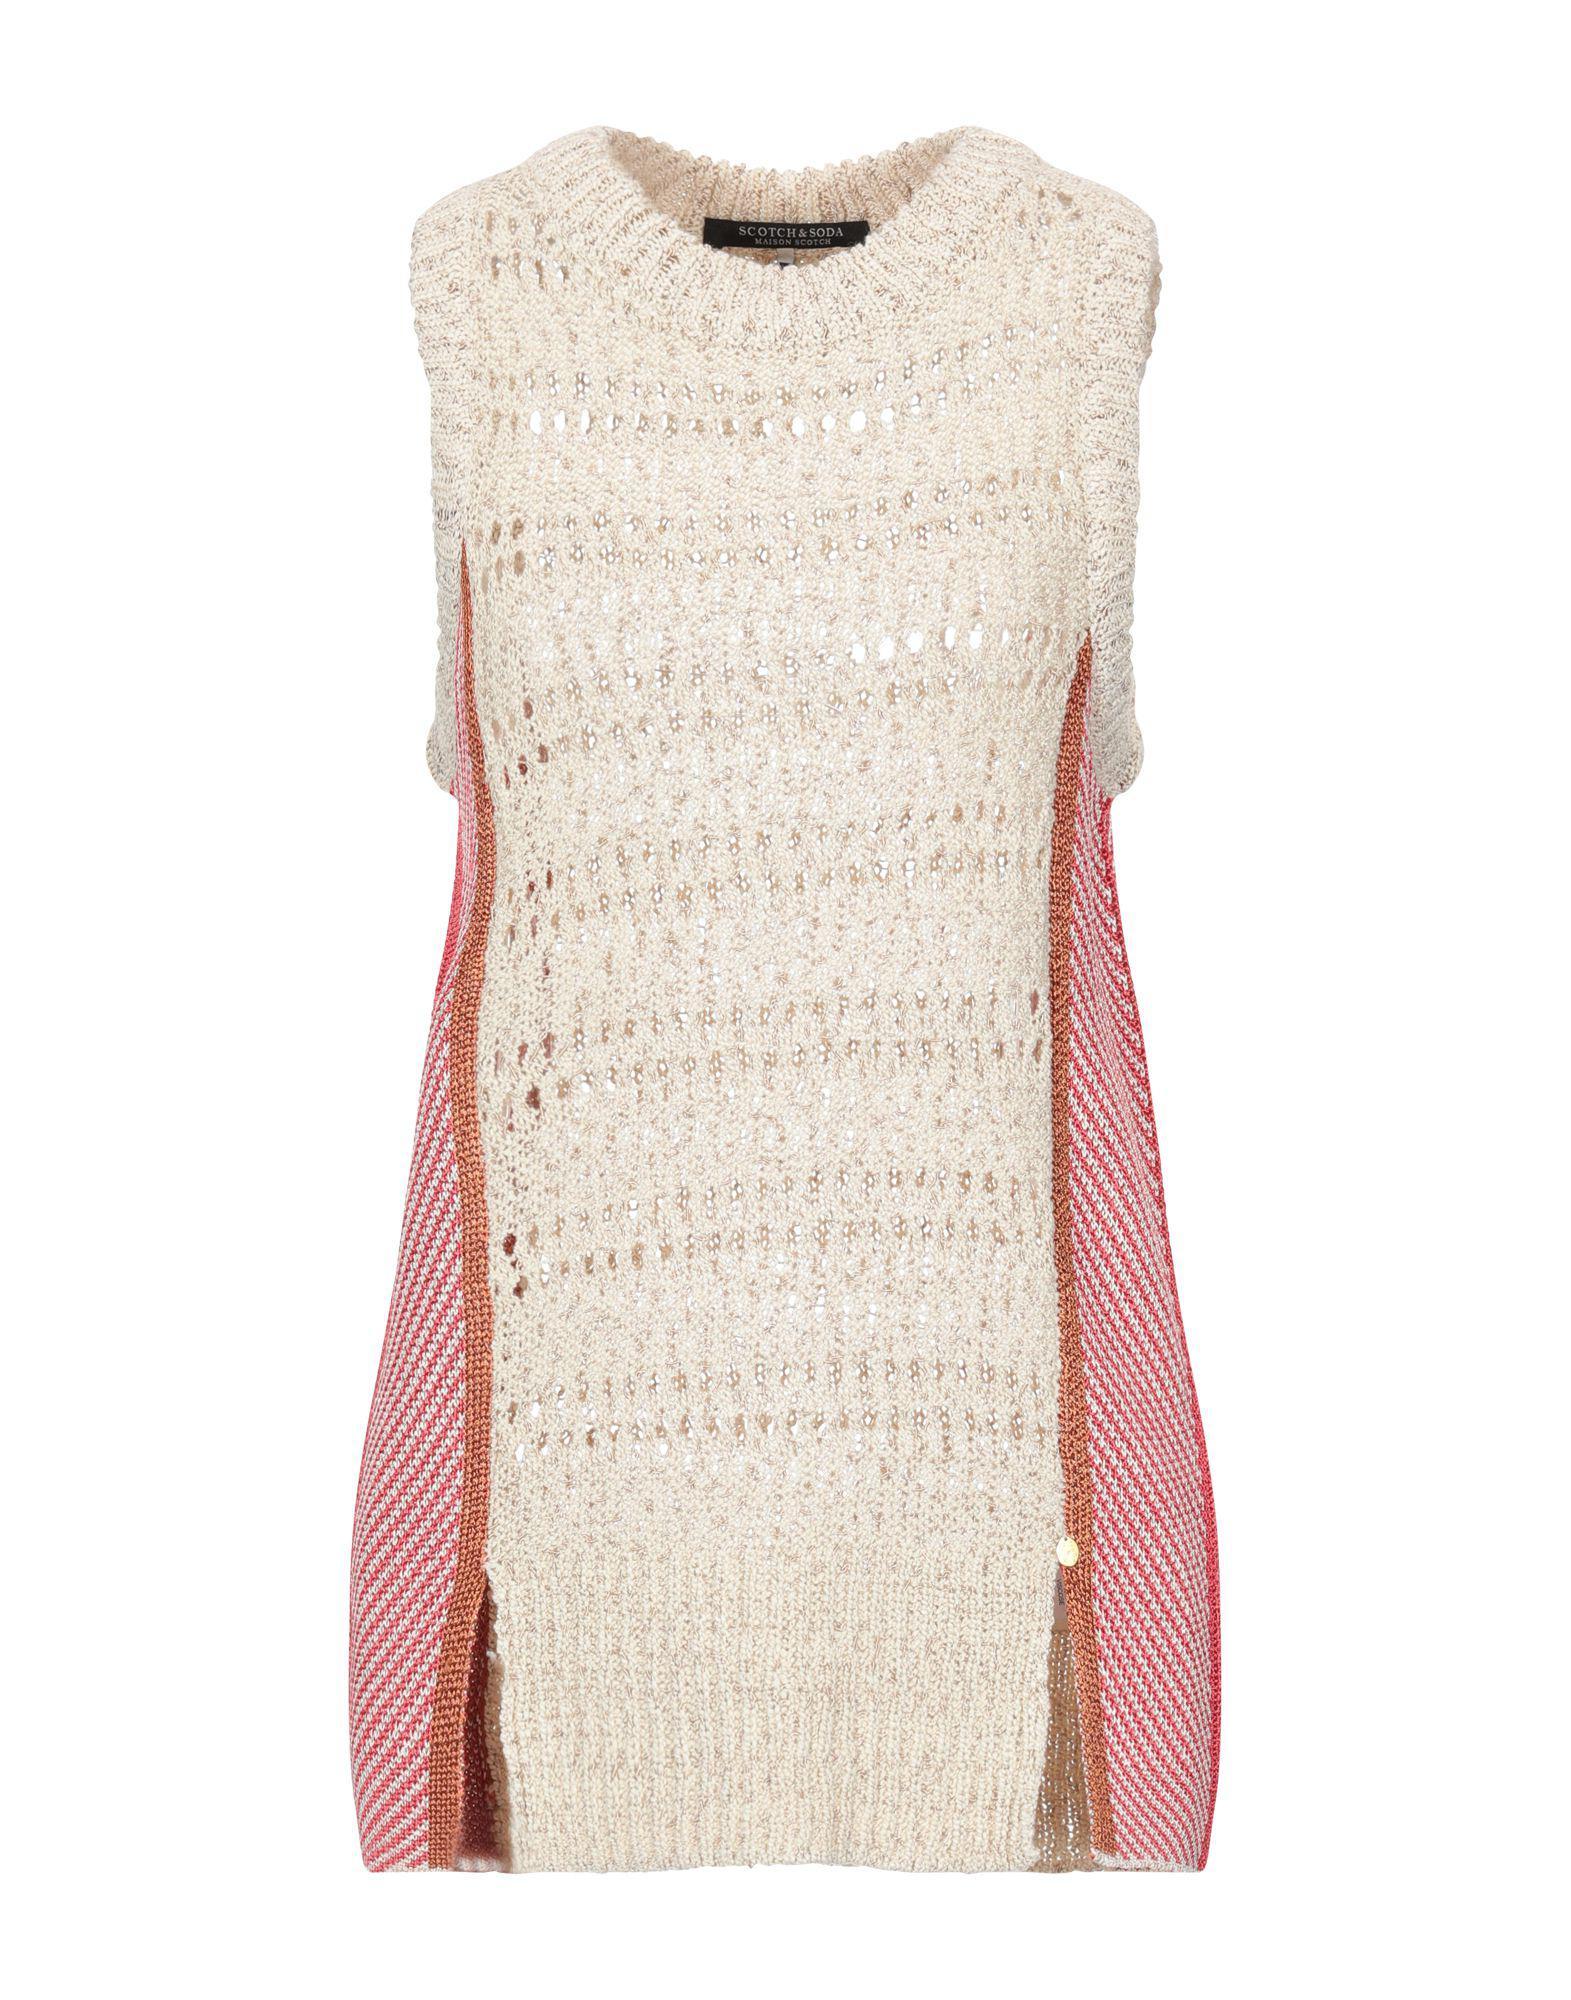 Maison Scotch - White Sweater - Lyst. View fullscreen d39c30248